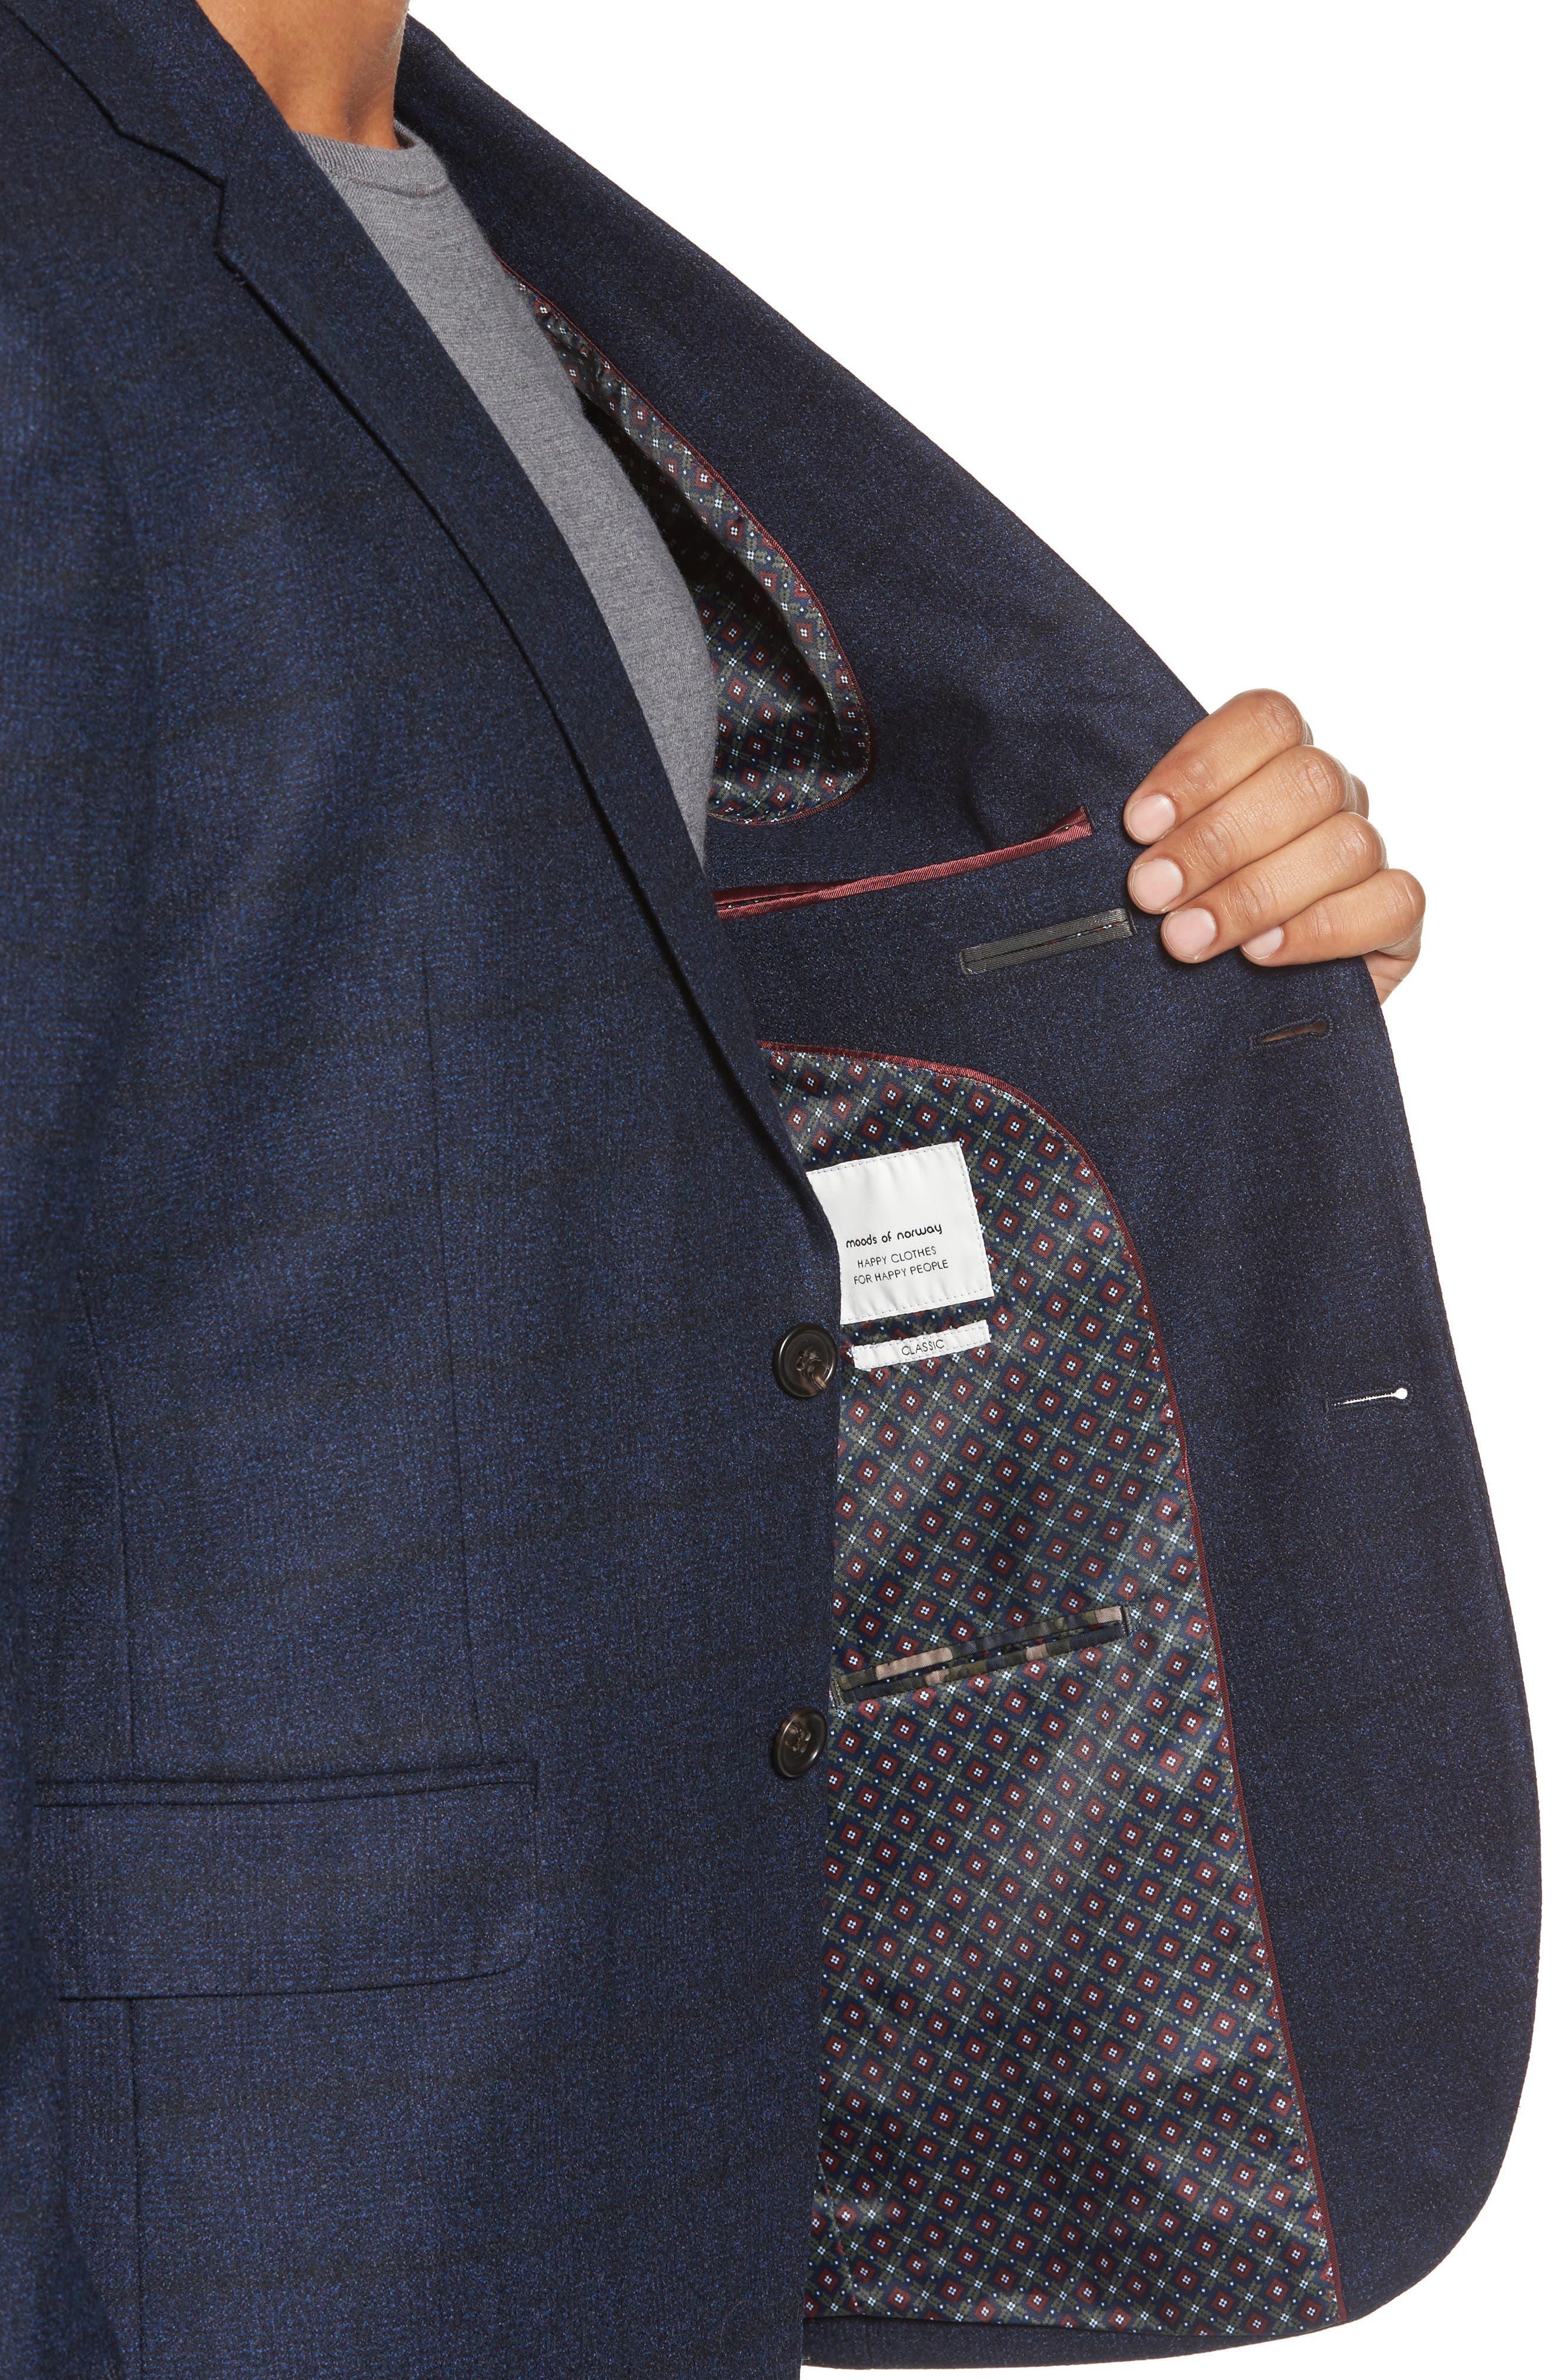 Andersen Trim Fit Plaid Wool Sport Coat,                             Alternate thumbnail 4, color,                             209